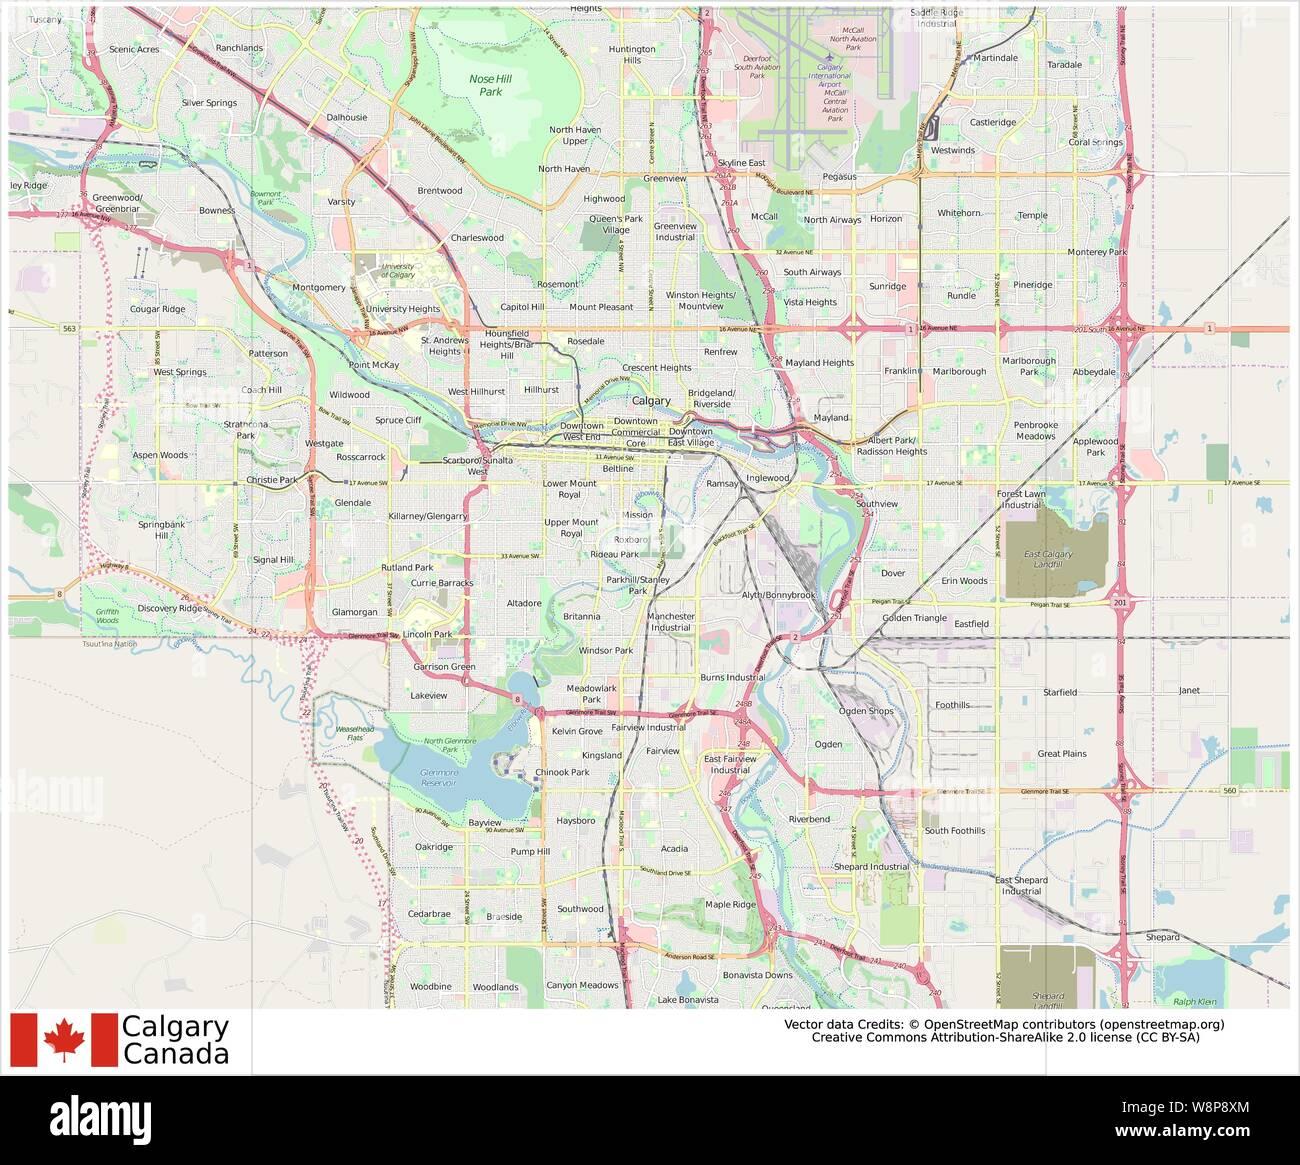 Calgary,Canada,North America Stock Vector Art & Illustration ... on northwest territory map america, pacific northwest coast of n america, calgary map world, calgary map usa, west coast of north america, map of northwest america,